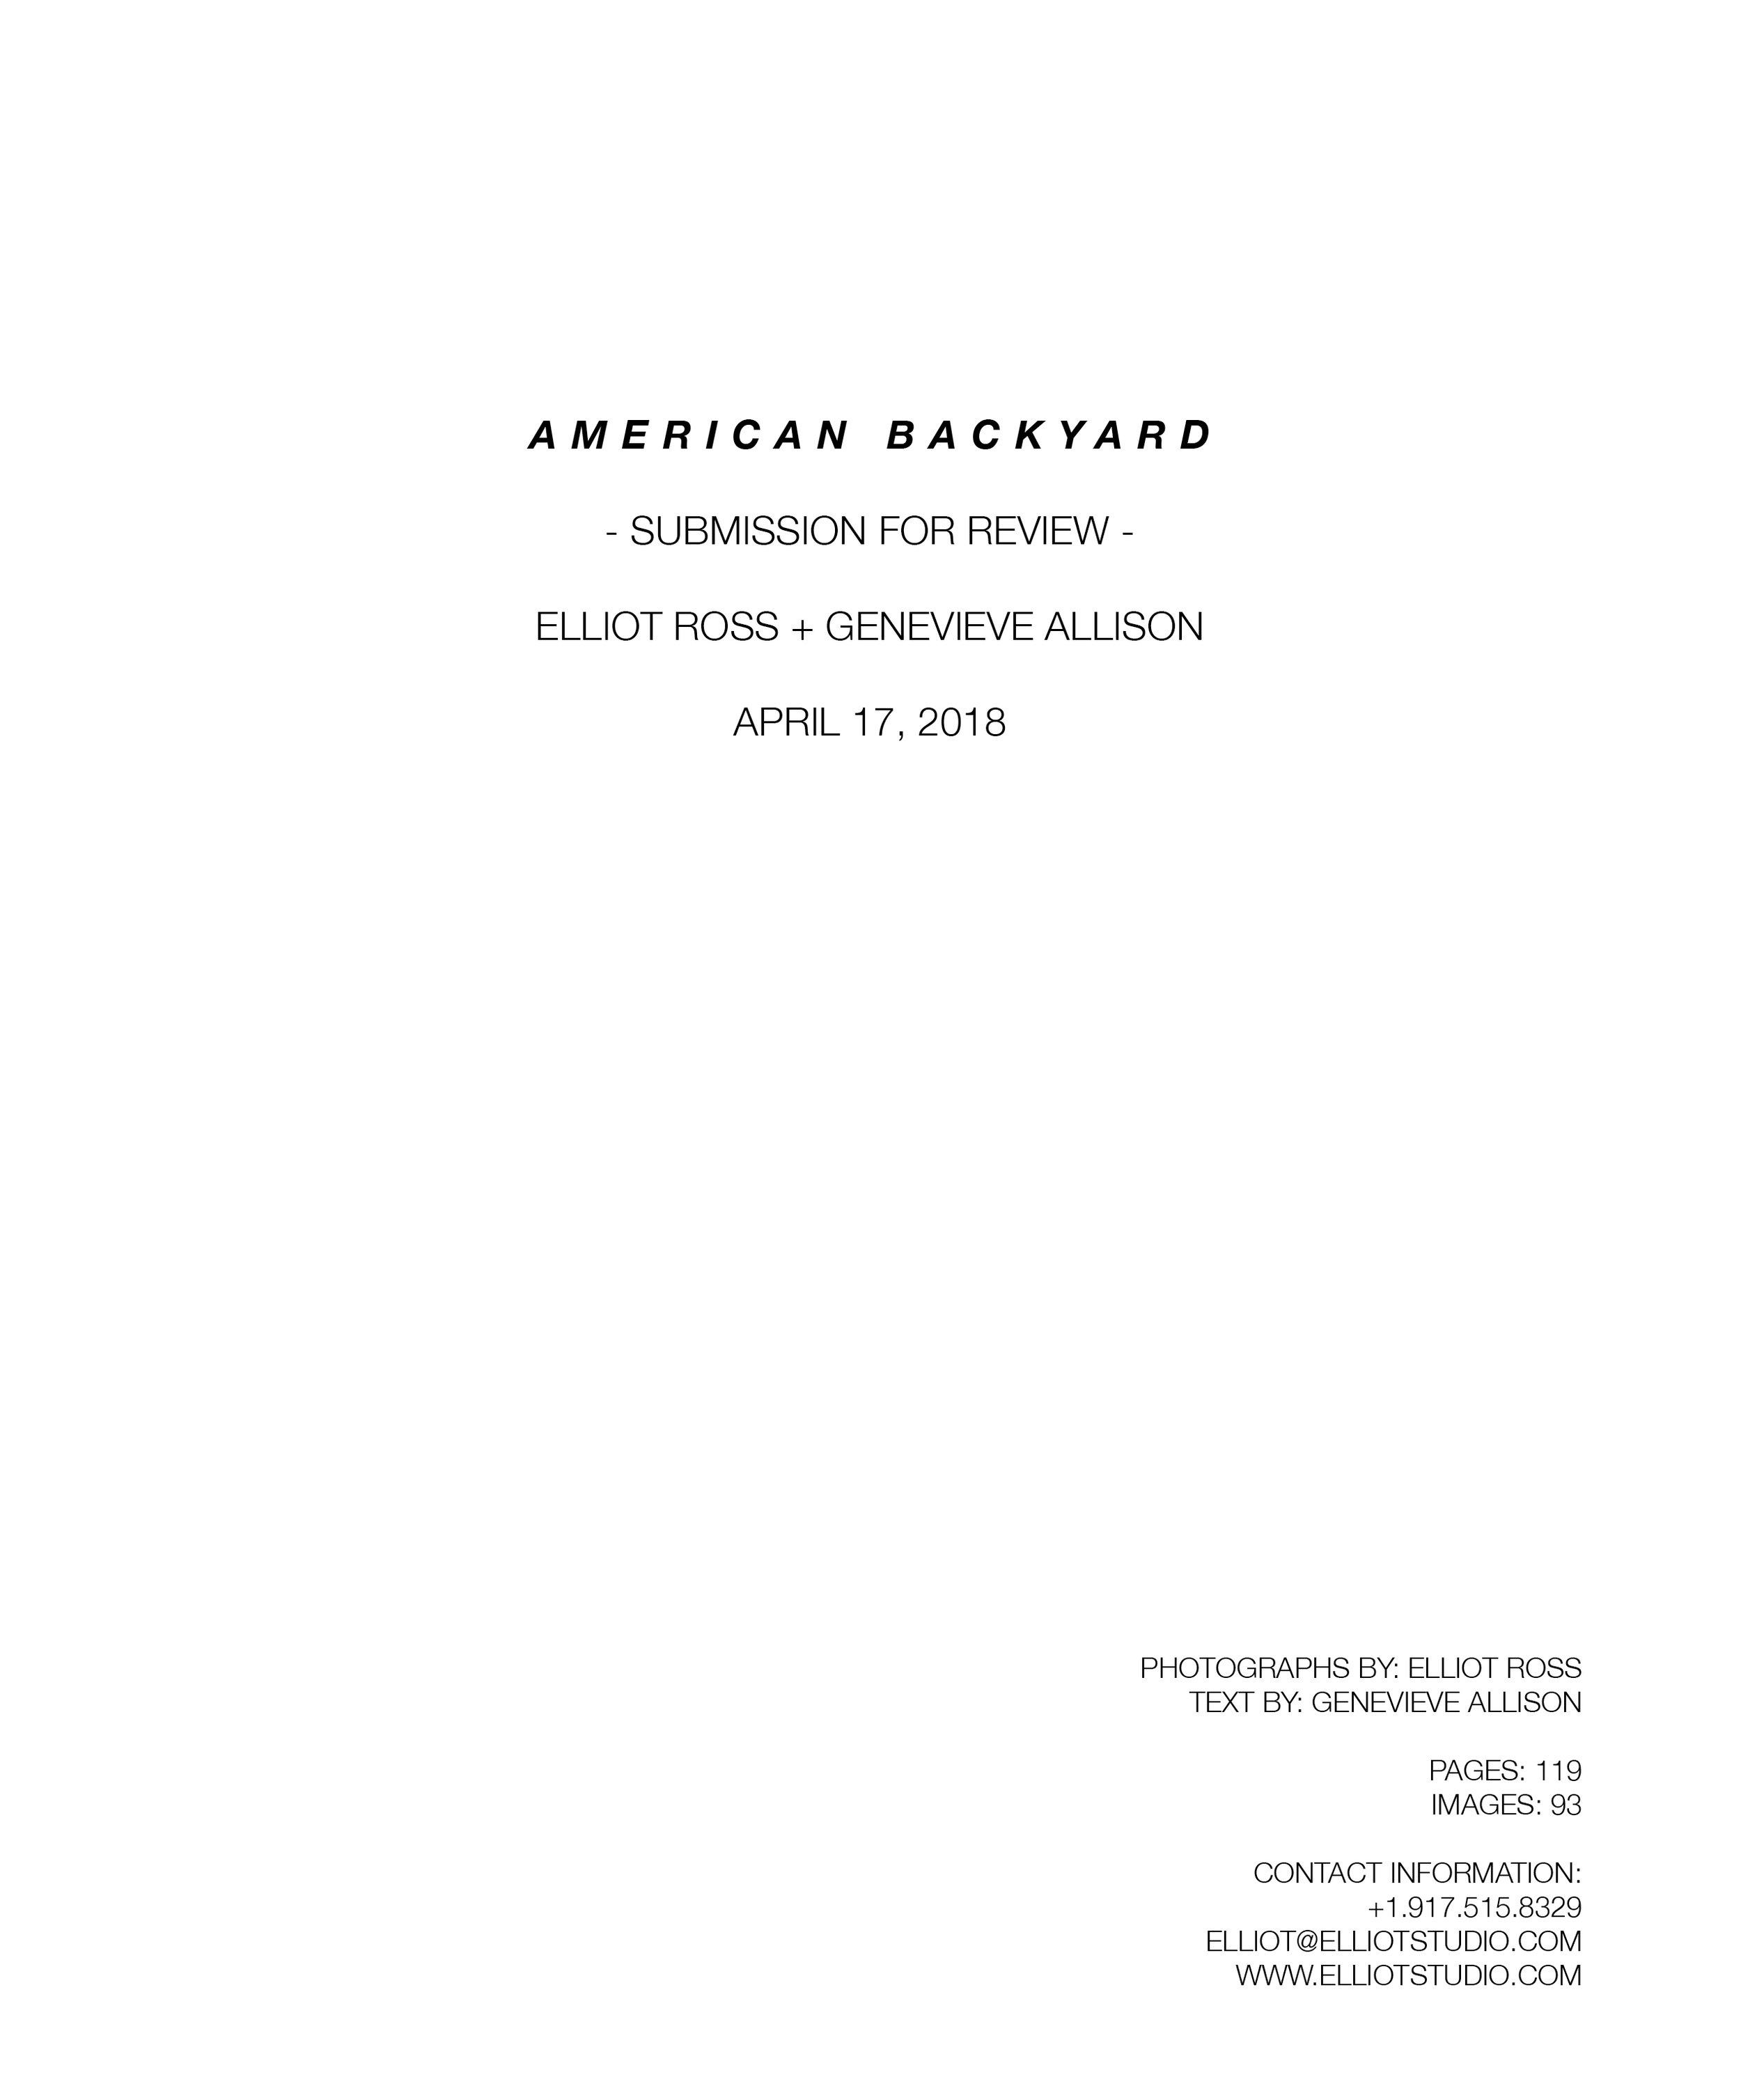 AmericanBackyard_ERoss_GAllison.jpg